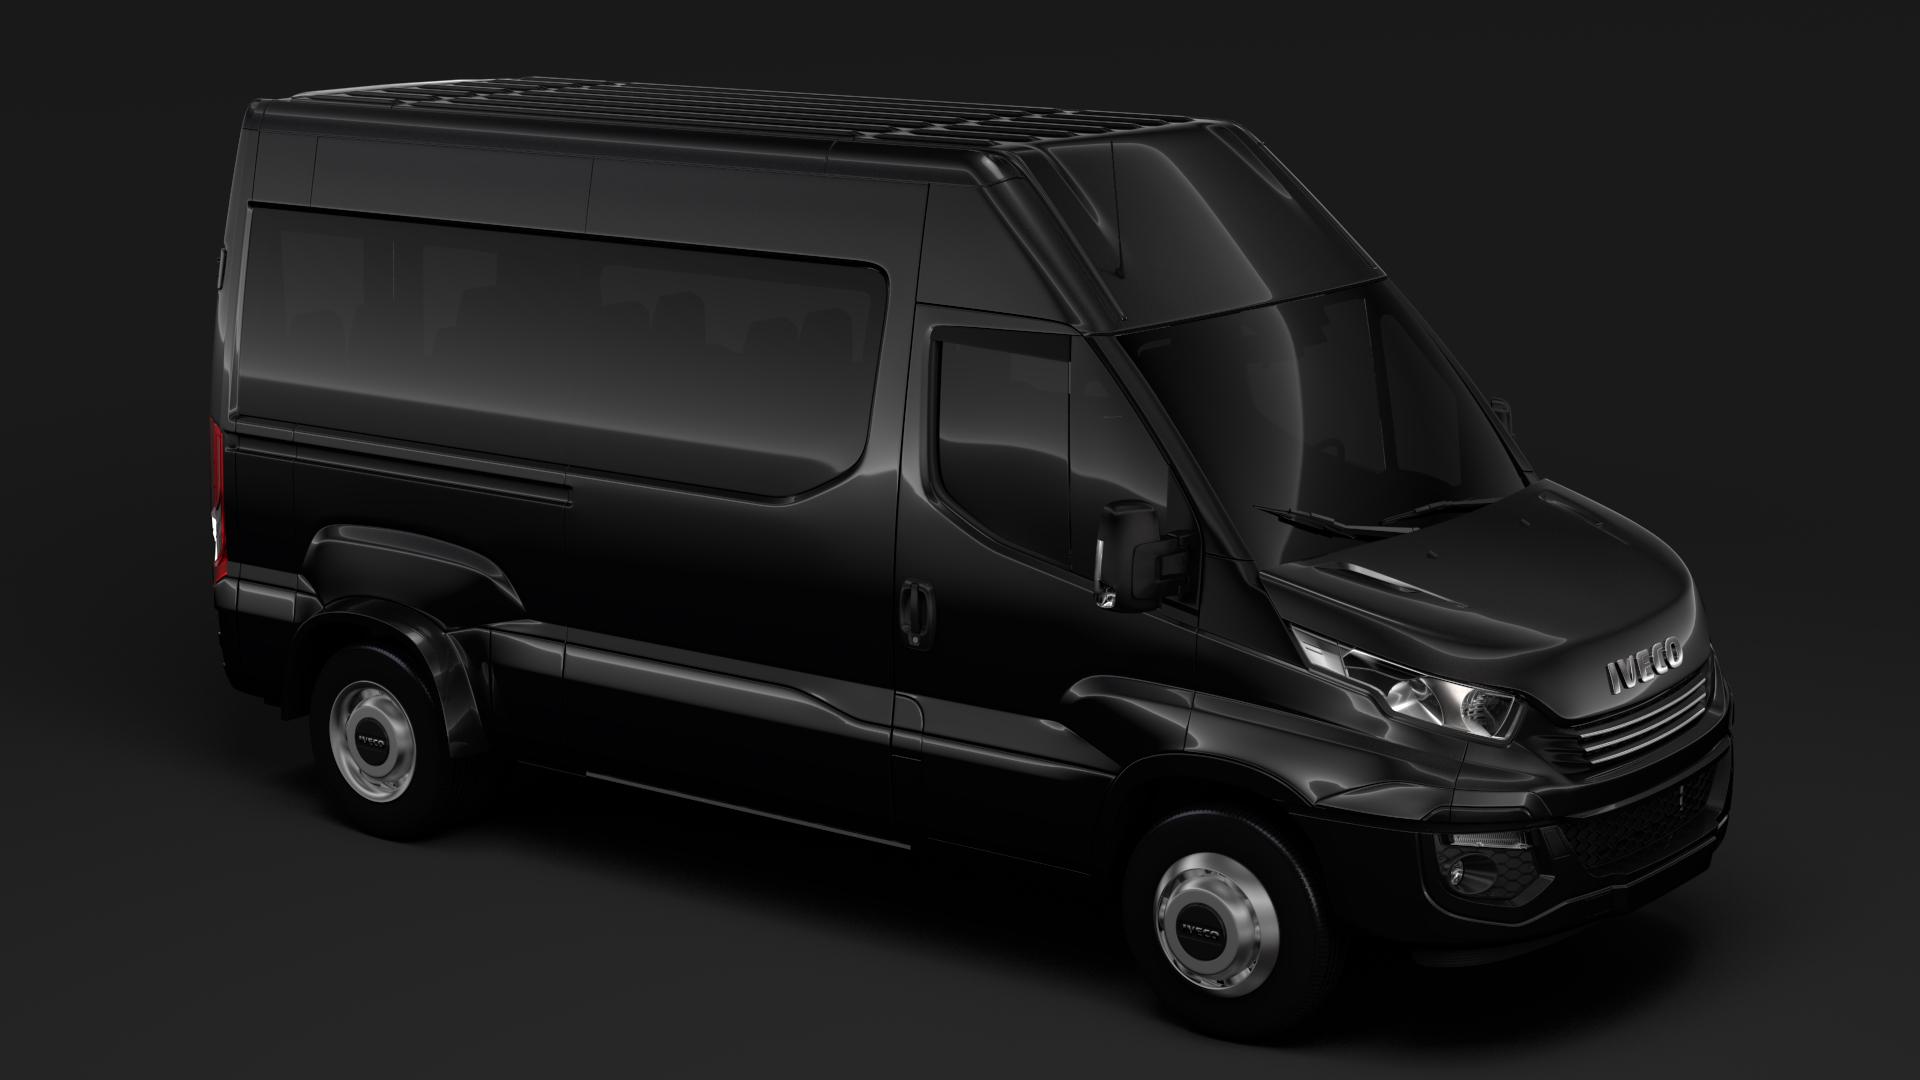 iveco daily minibus l2h2 2017 3d model max fbx c4d lwo ma mb hrc xsi obj 276018